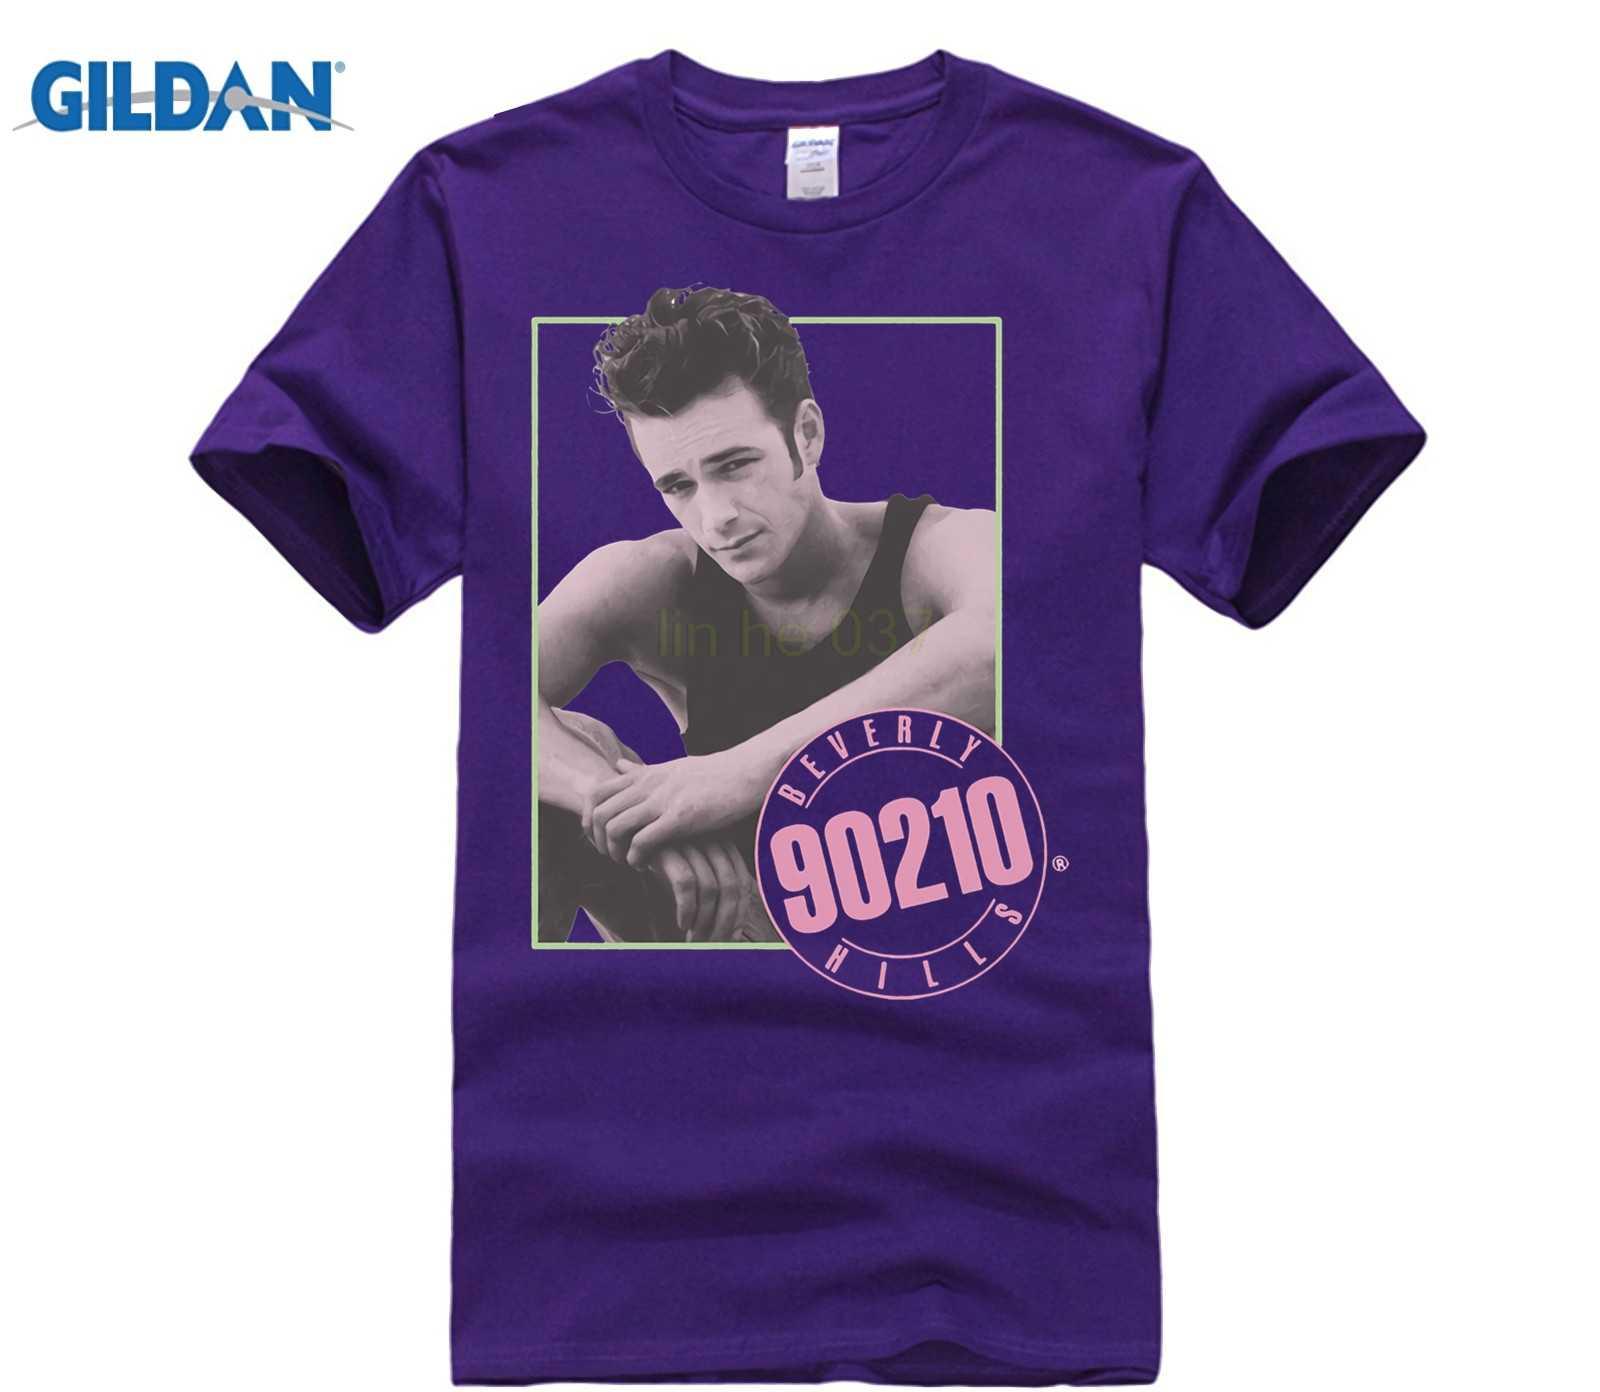 0f22273a0 ... Gildan Beverly Hills 90210 Tv Show Dylan Mckay Luke Perry Picture Adult  Men'S Crew Neck Short